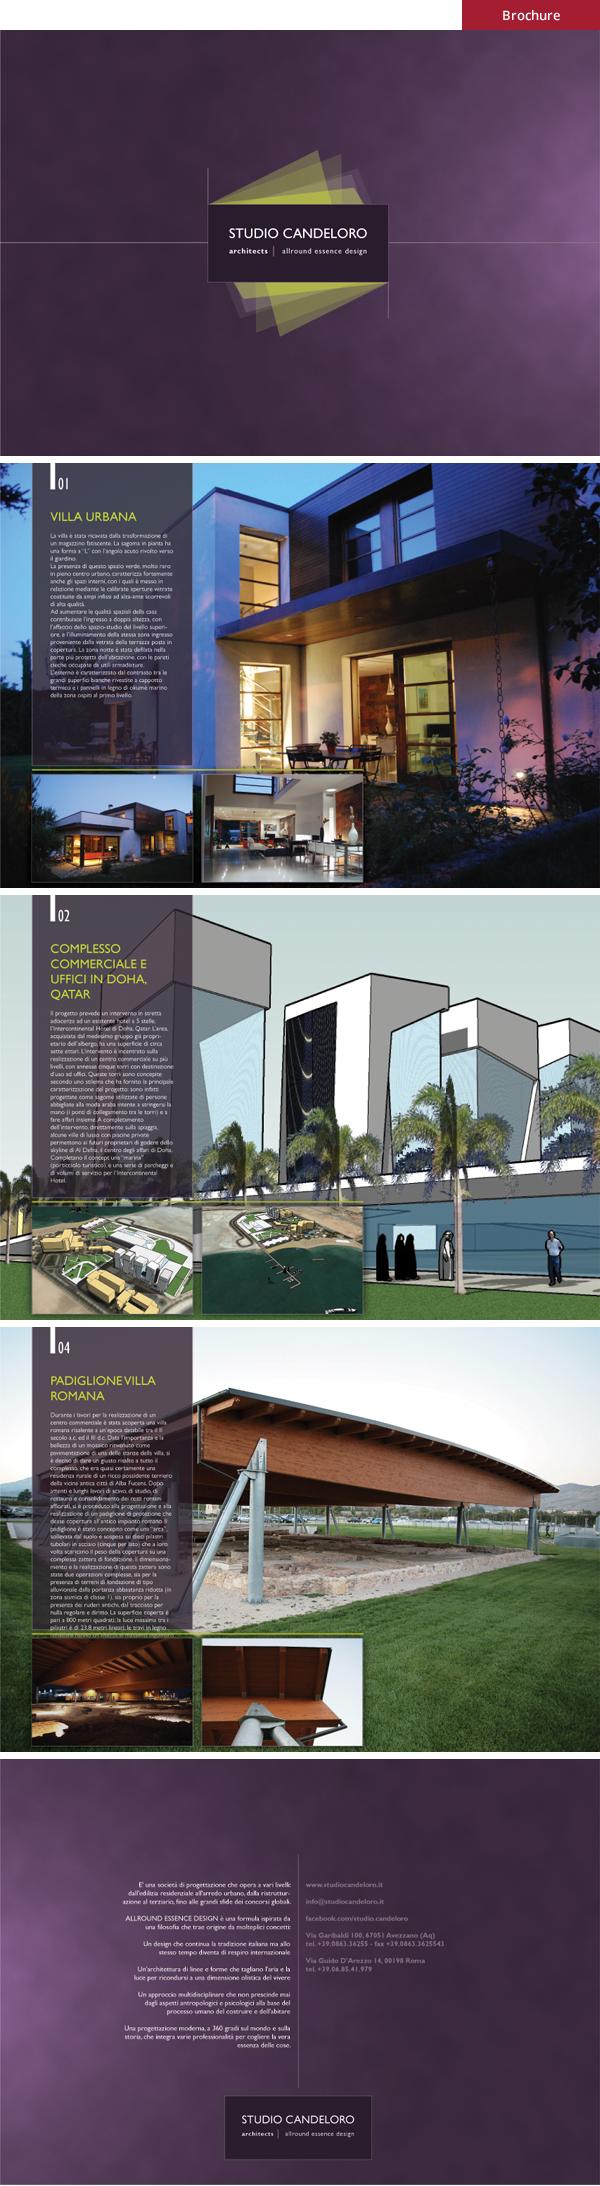 Studio Candeloro - Brochure